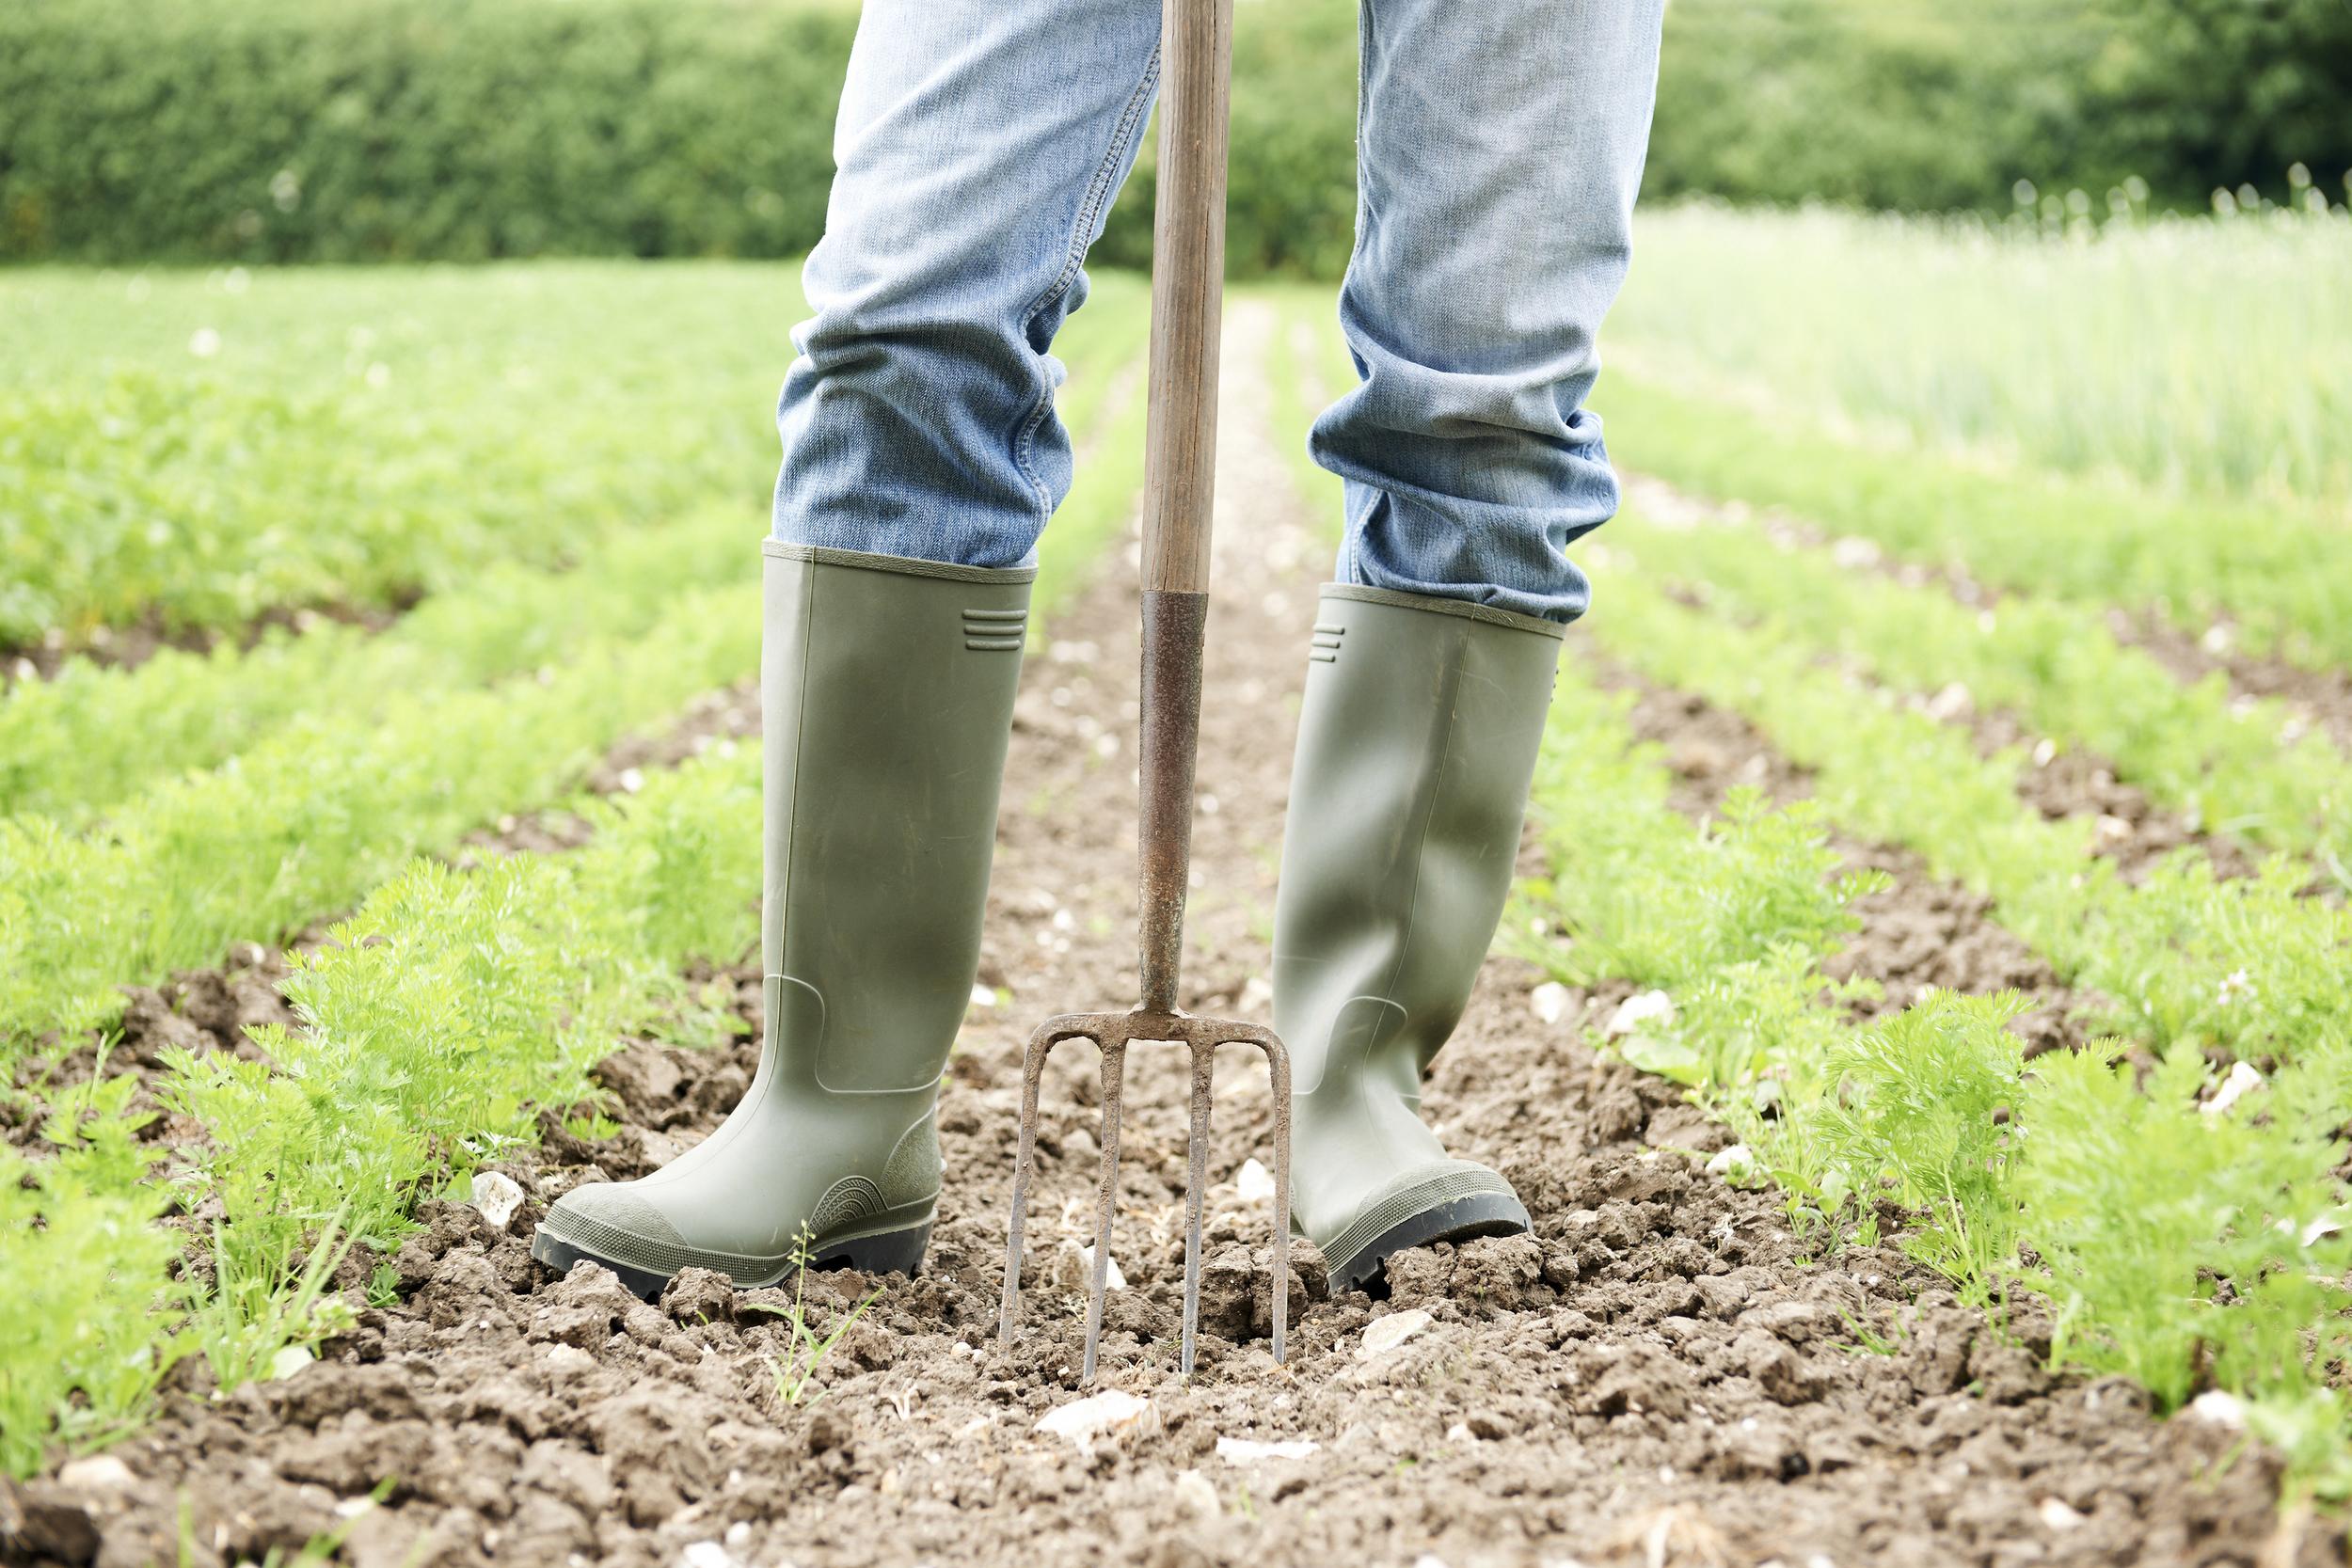 bigstock-Close-Up-Of-Farmer-Working-In--67841029.jpg